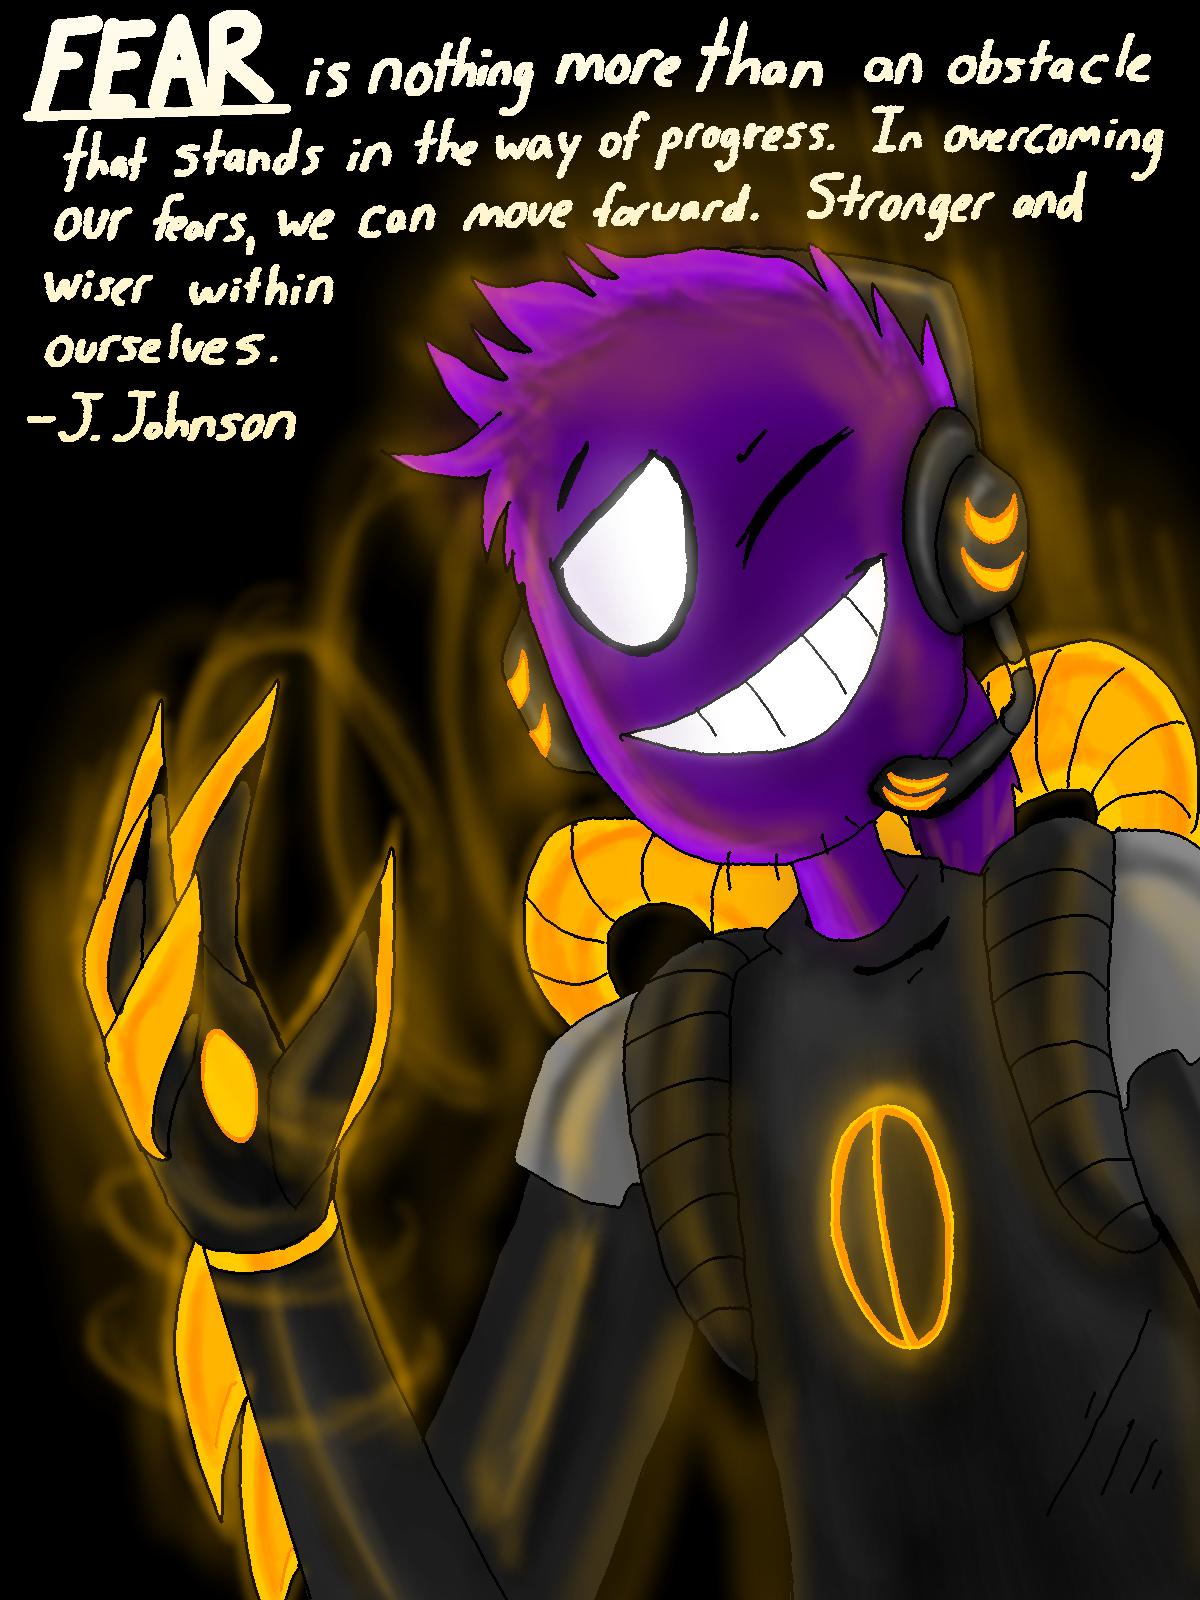 Vince of Rebornica's Night Terror